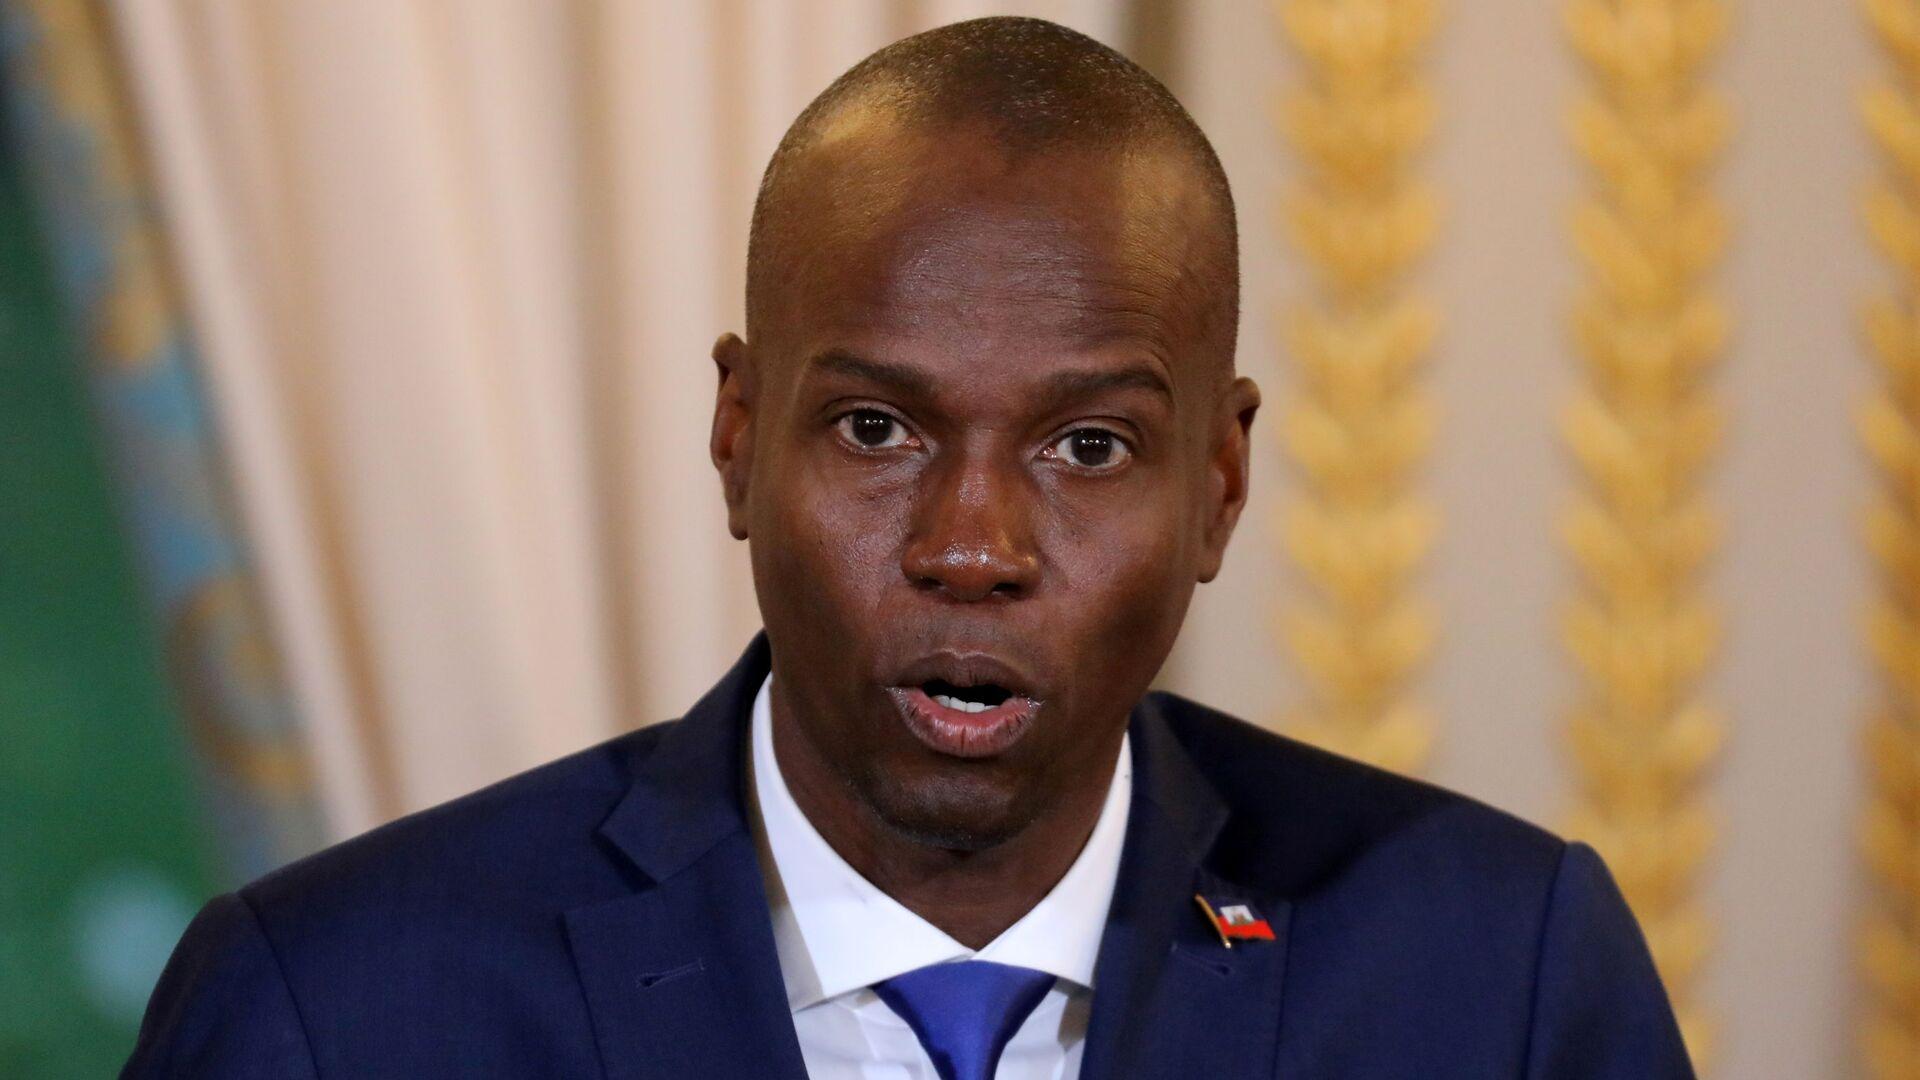 Il presidente del Haiti Moise Jovenel - Sputnik Italia, 1920, 31.07.2021